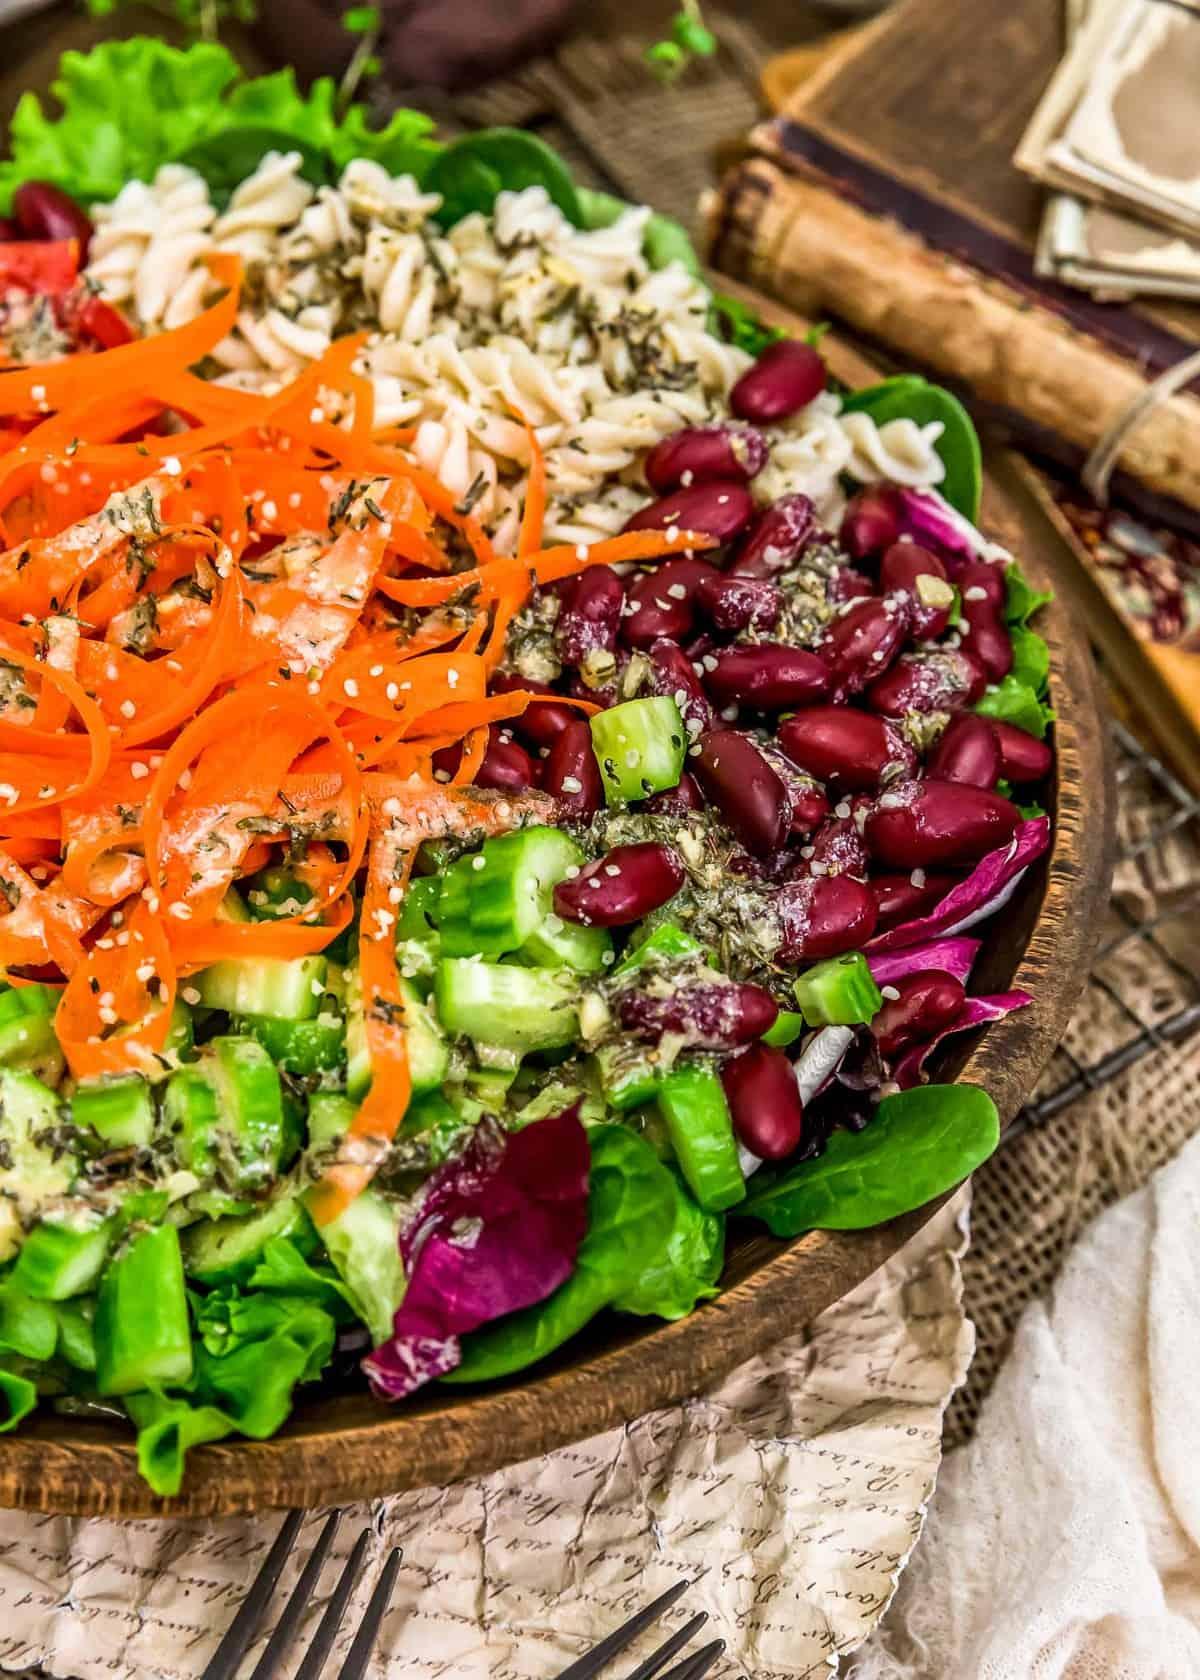 Oil Free Herb Vinaigrette on a salad